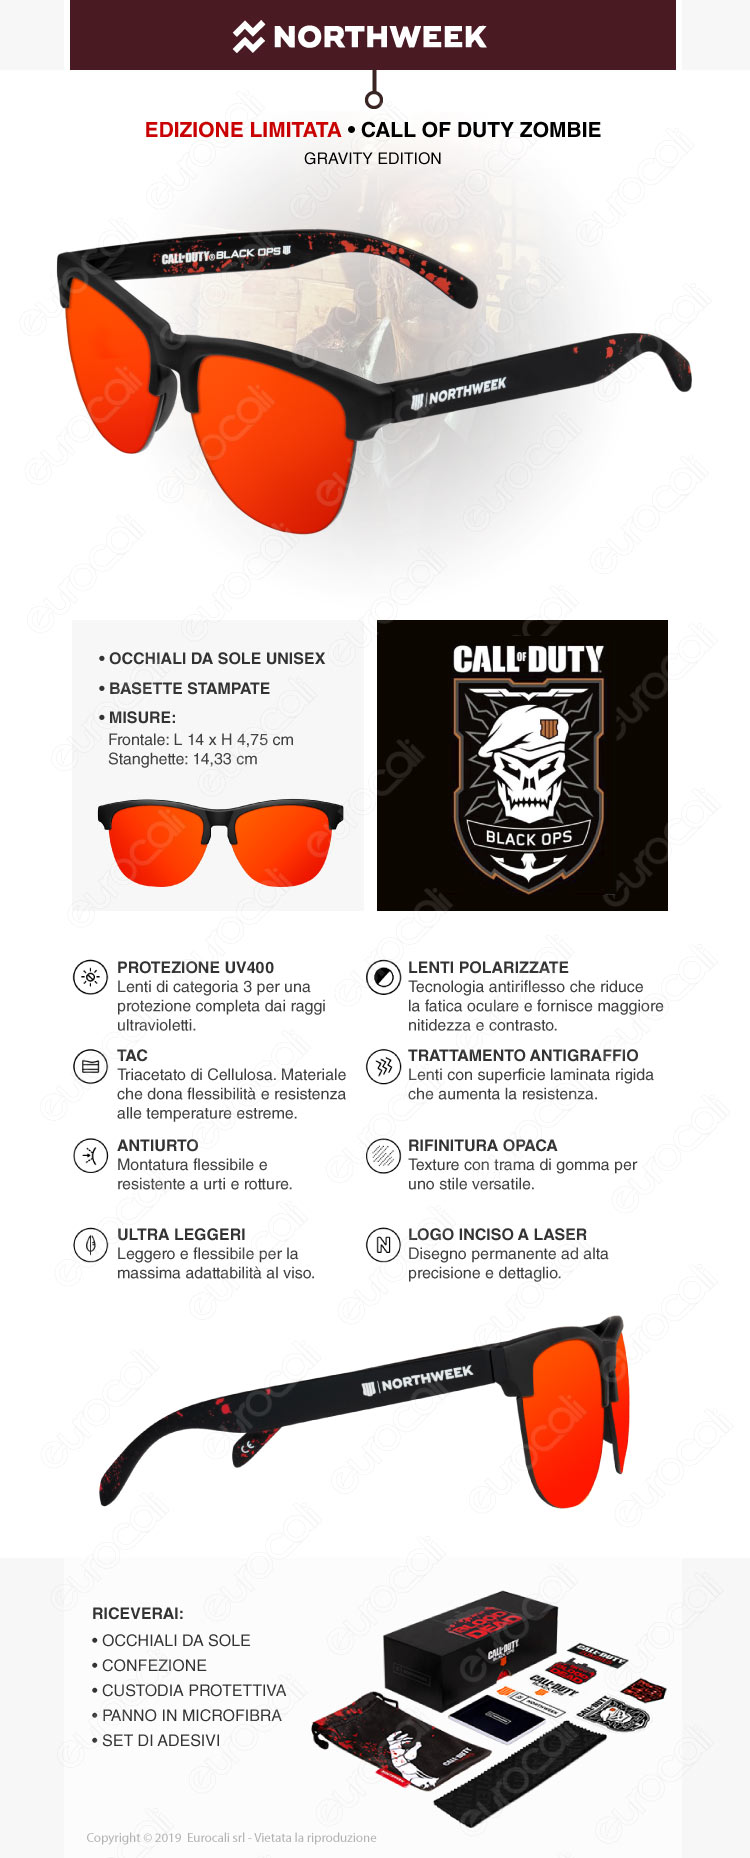 Northweek occhiali da sole